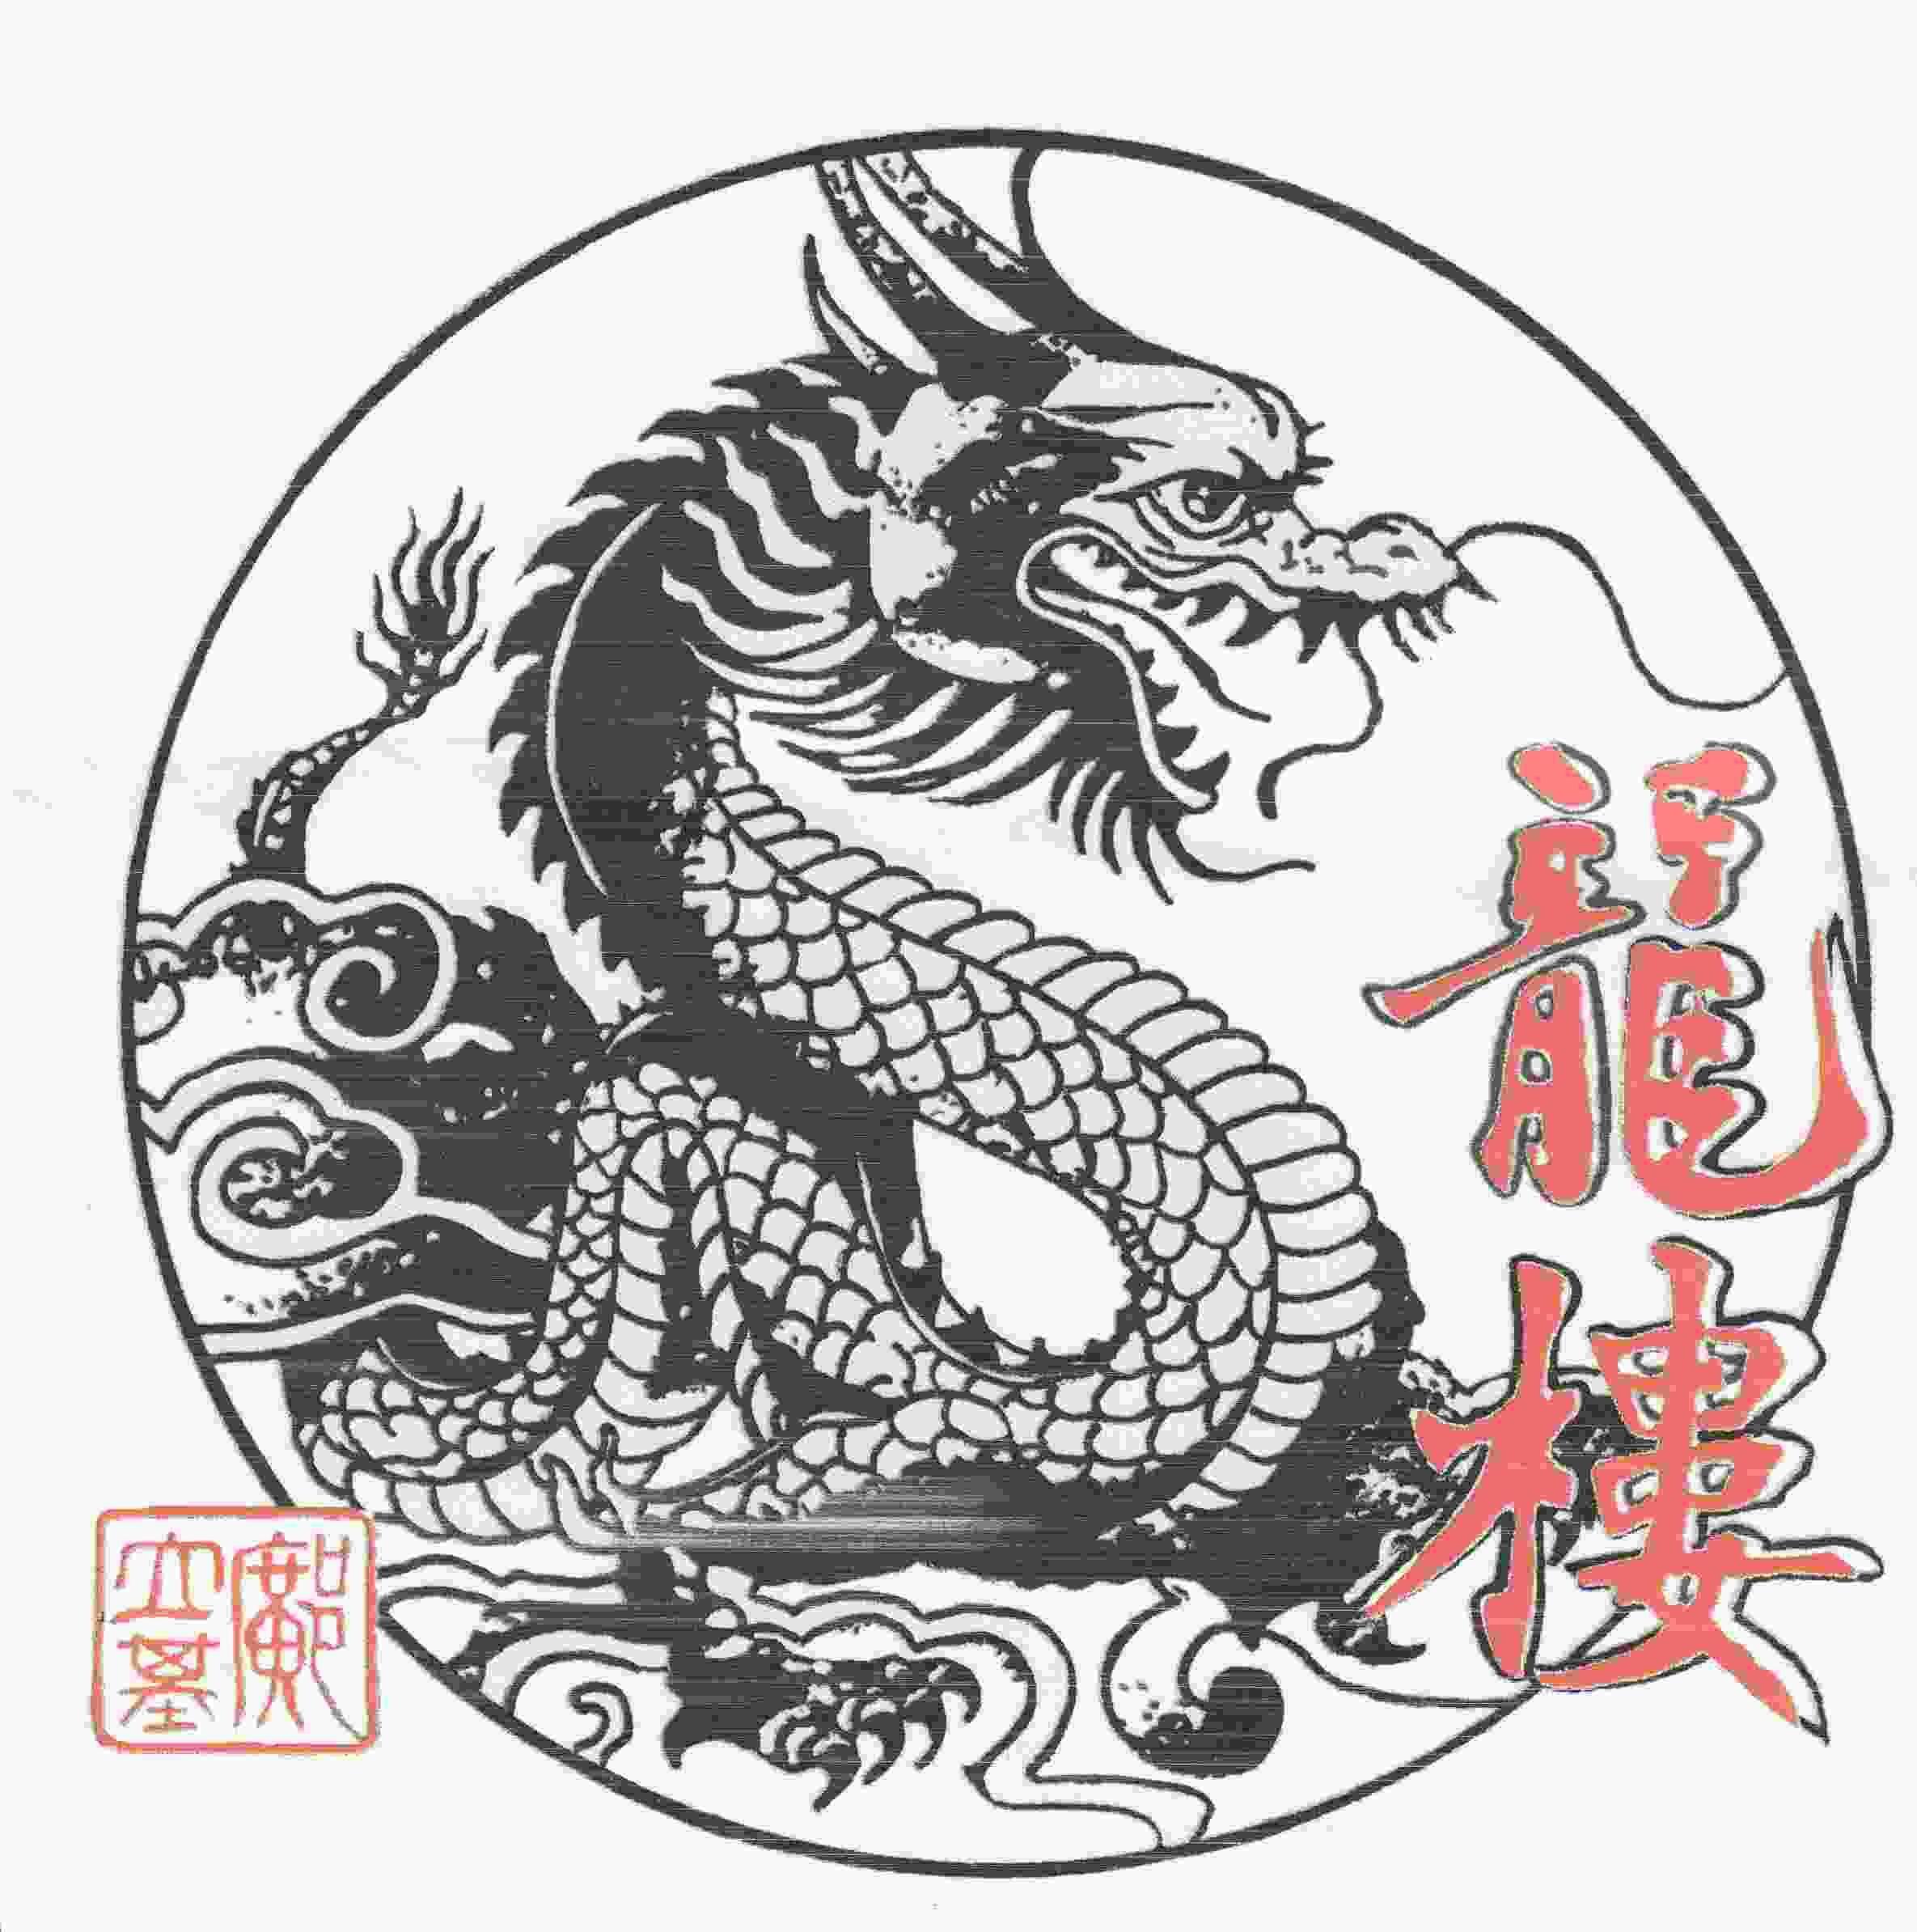 dragon china - Поиск в Google   samurai   Pinterest